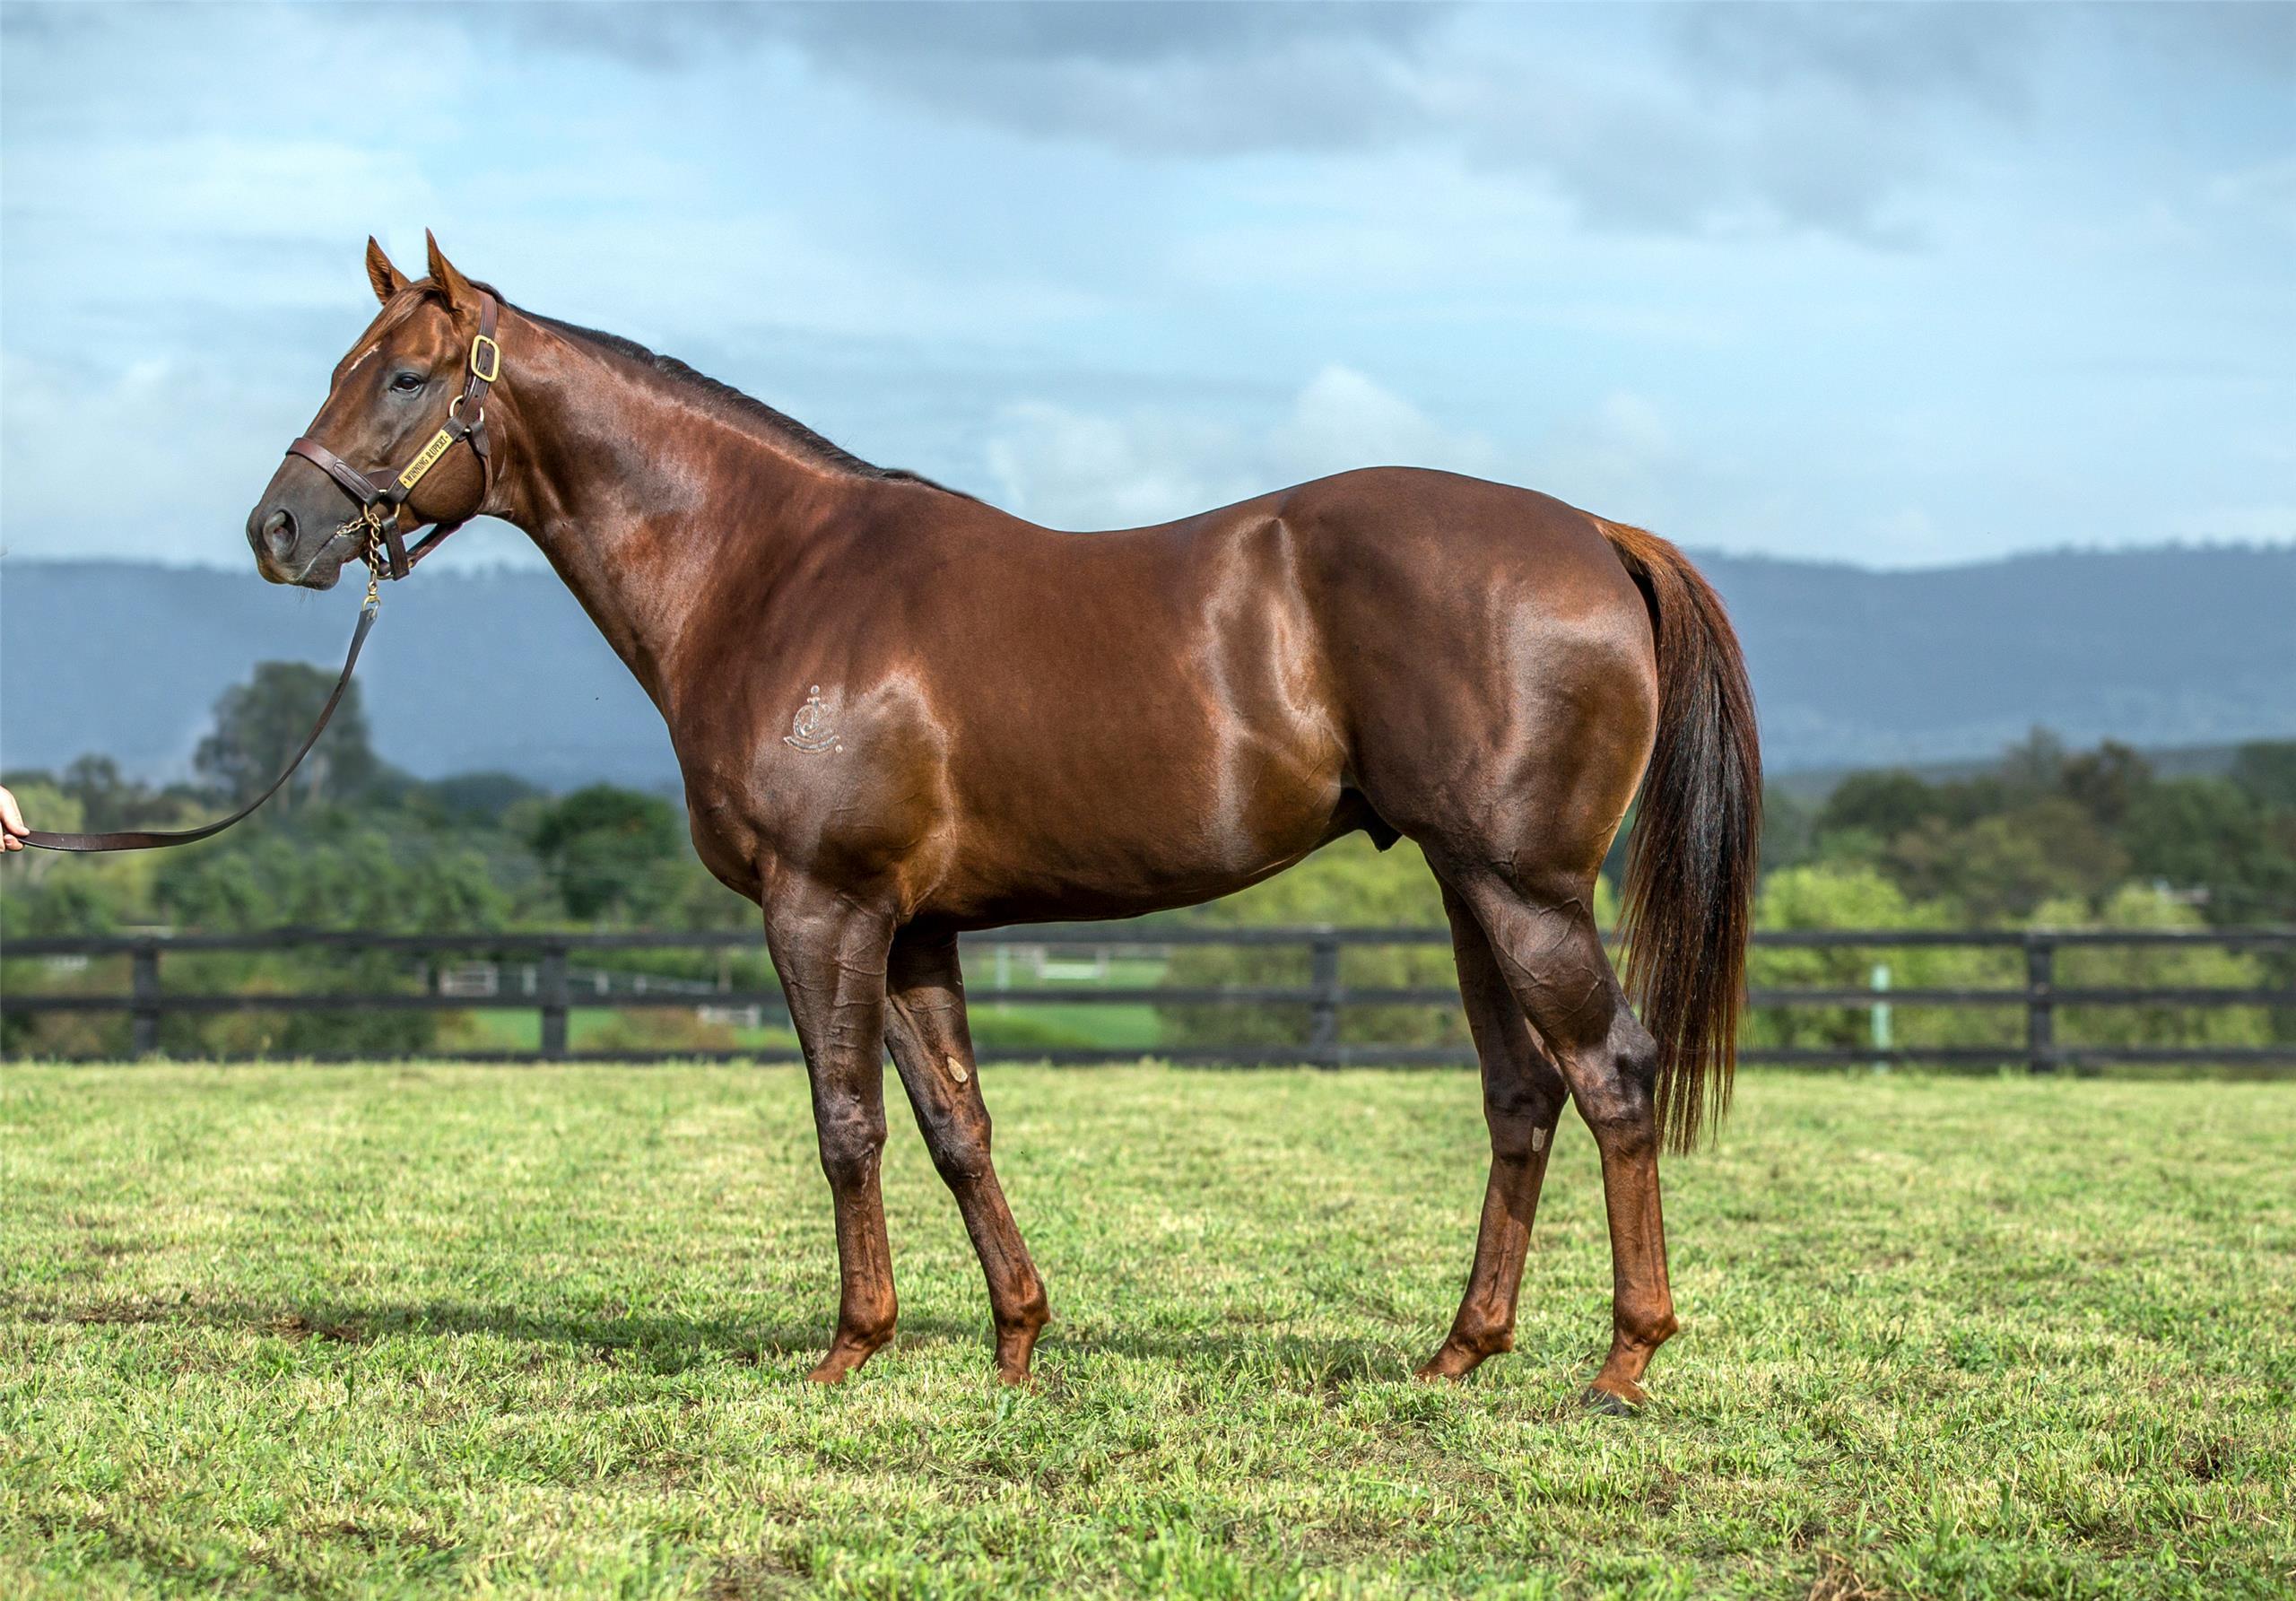 https://www.stallions.com.au/wp-content/uploads/2019/09/winning_rupert_1_resized4-9-2018-9-16-59-201.jpg